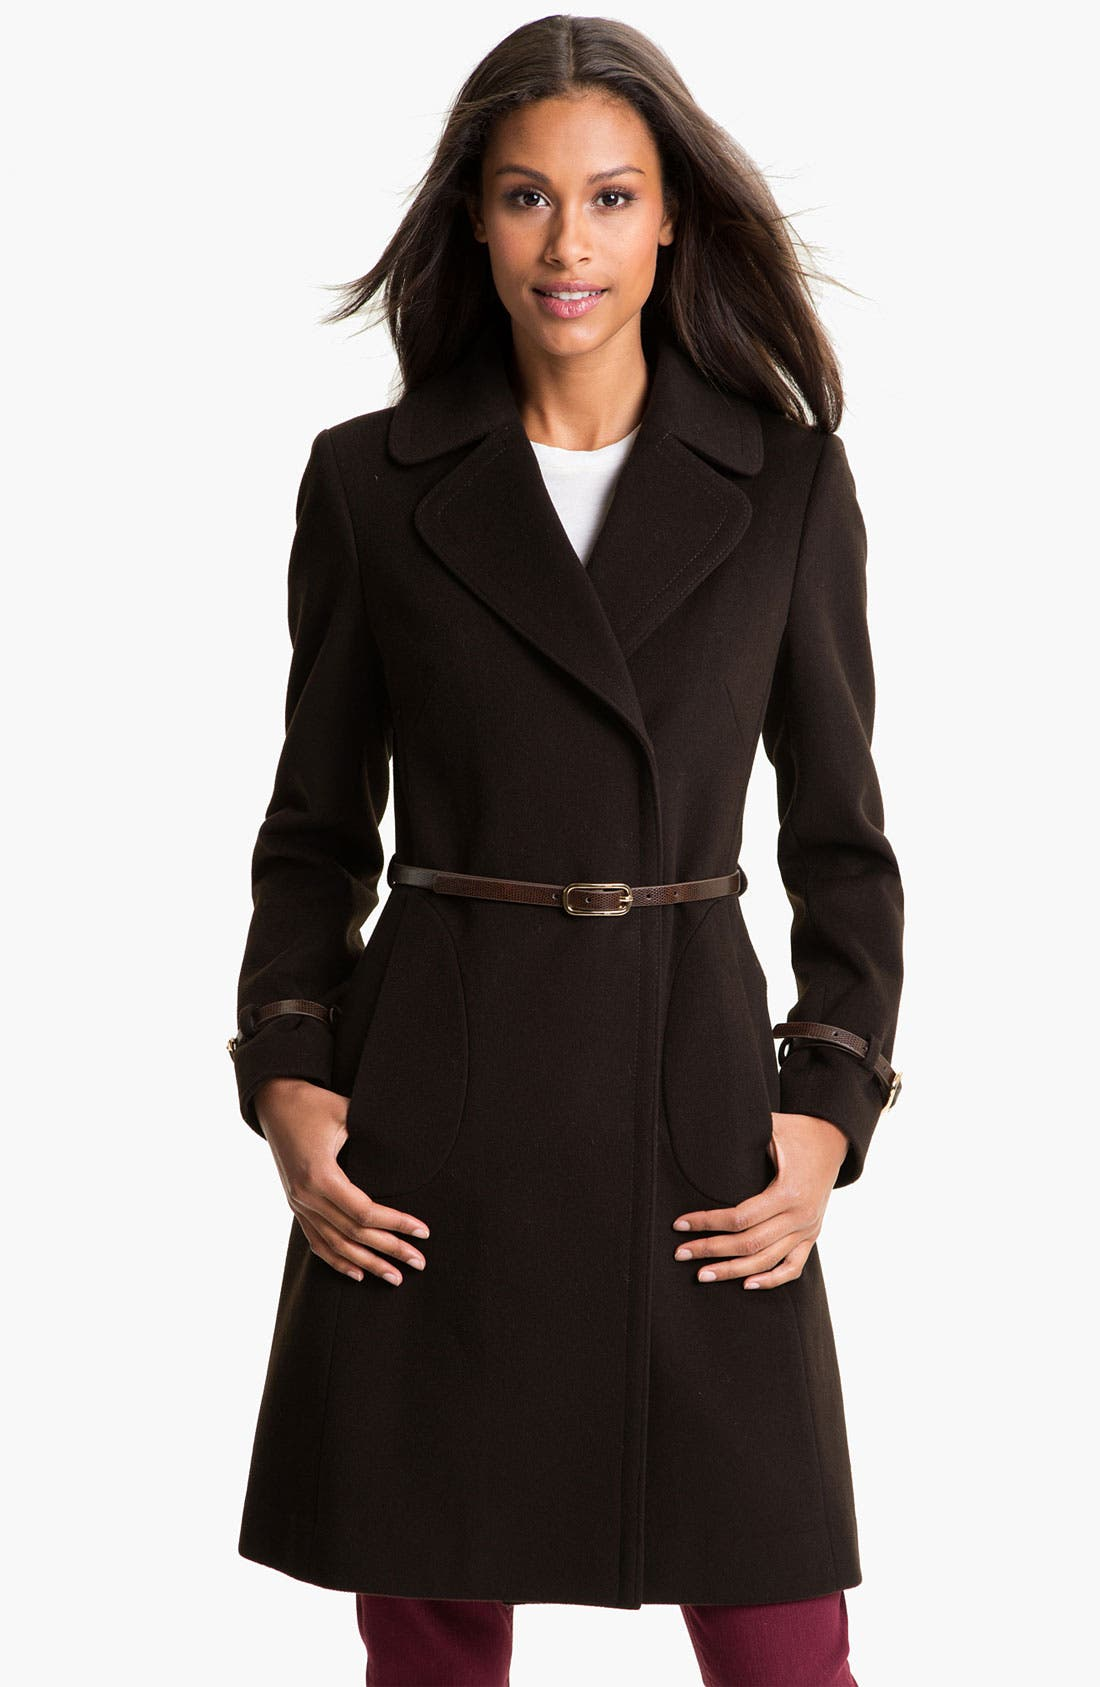 Alternate Image 1 Selected - Via Spiga 'Kate' Belted Notch Collar Coat